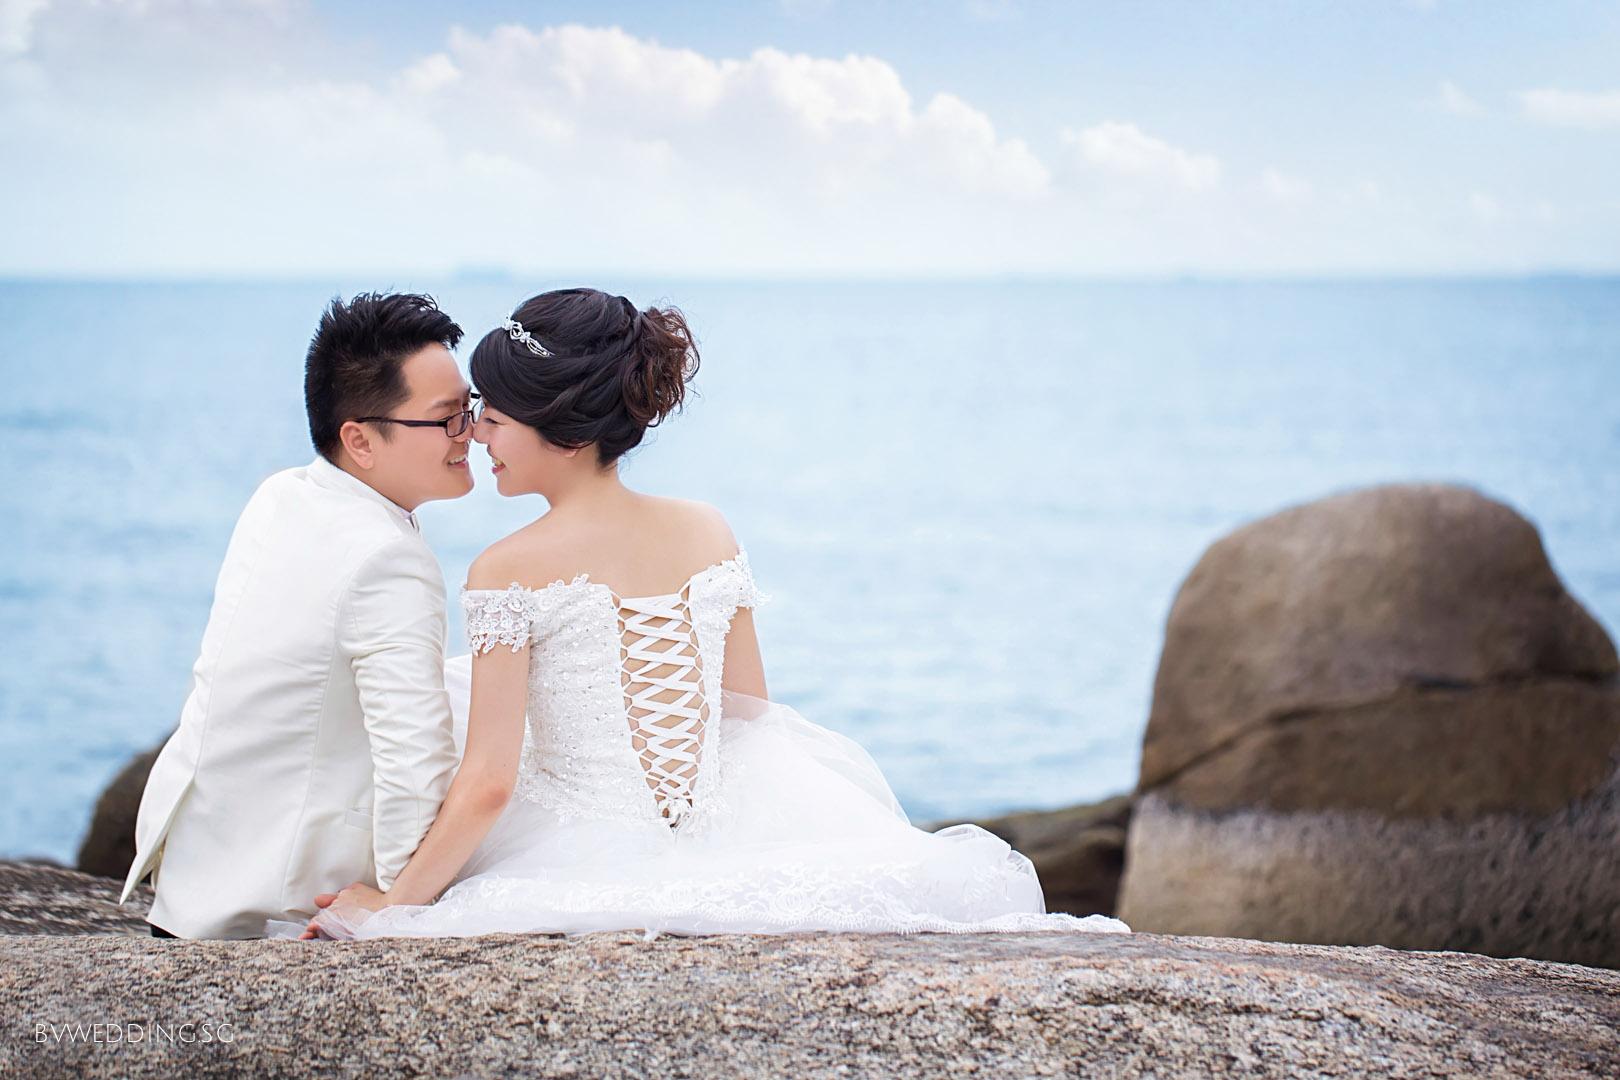 Pre-wedding photoshoot at Bintan Island Beach